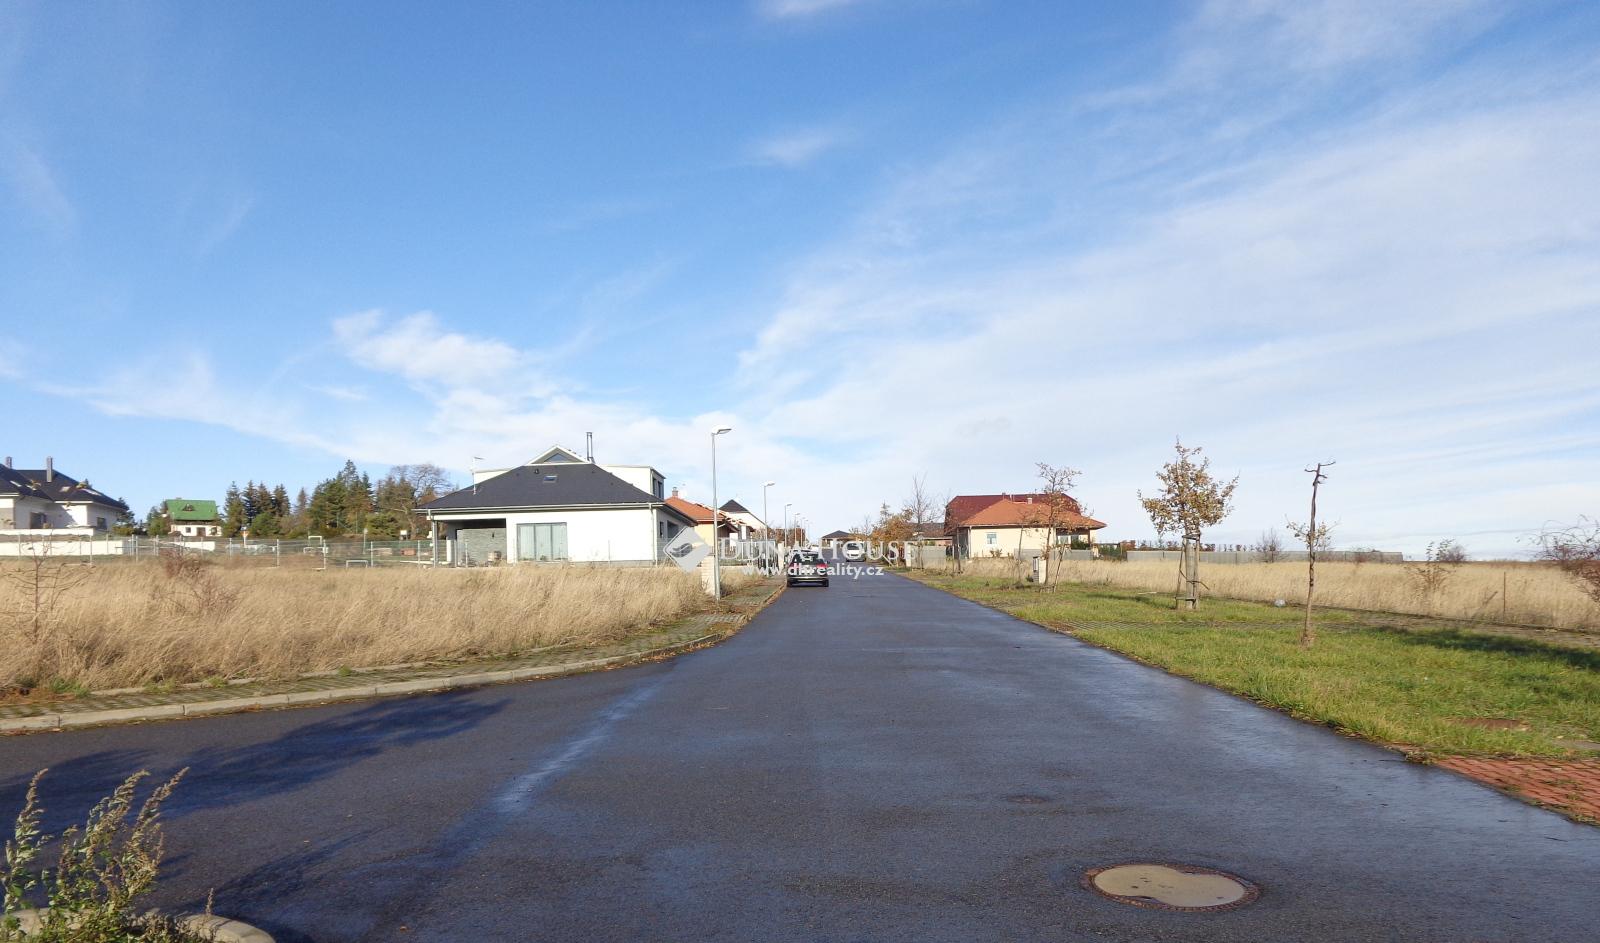 Prodej pozemku, Líšnice, Okres Praha-západ